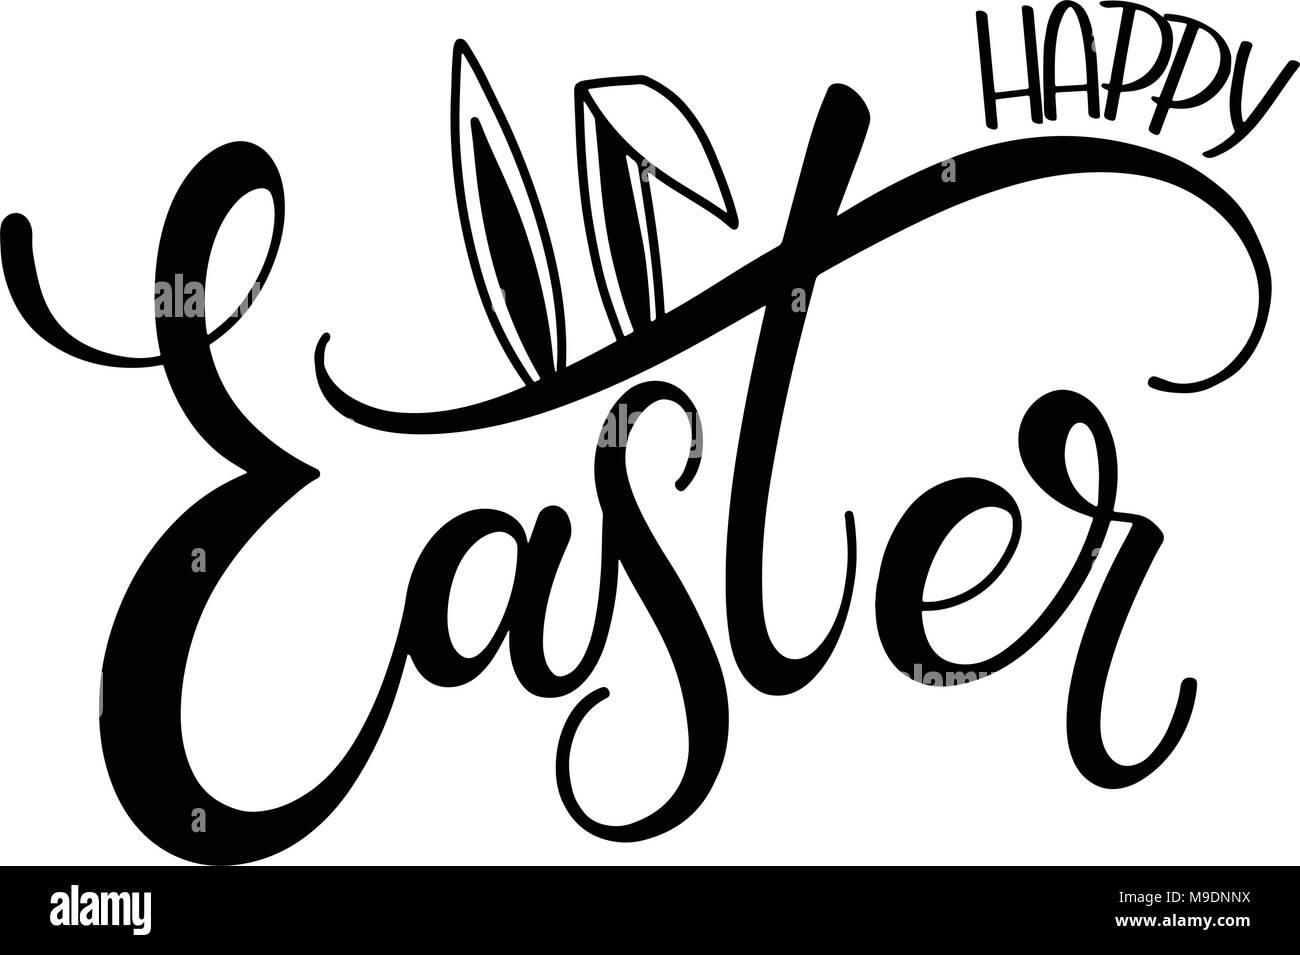 Happy easter lettering hand written easter phrases seasons happy easter lettering hand written easter phrases seasons greetings m4hsunfo